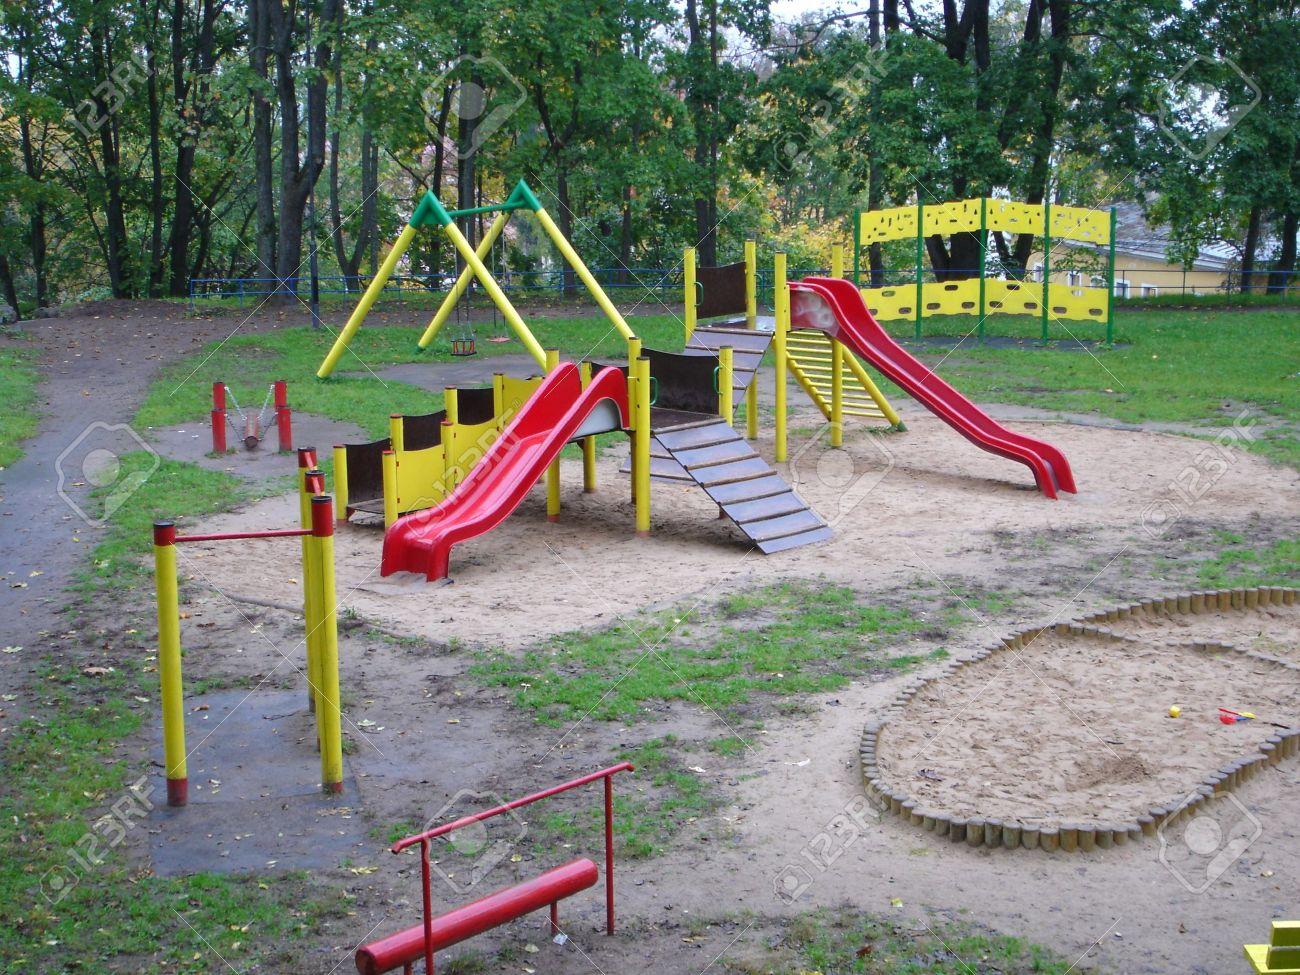 Park Playground Slide